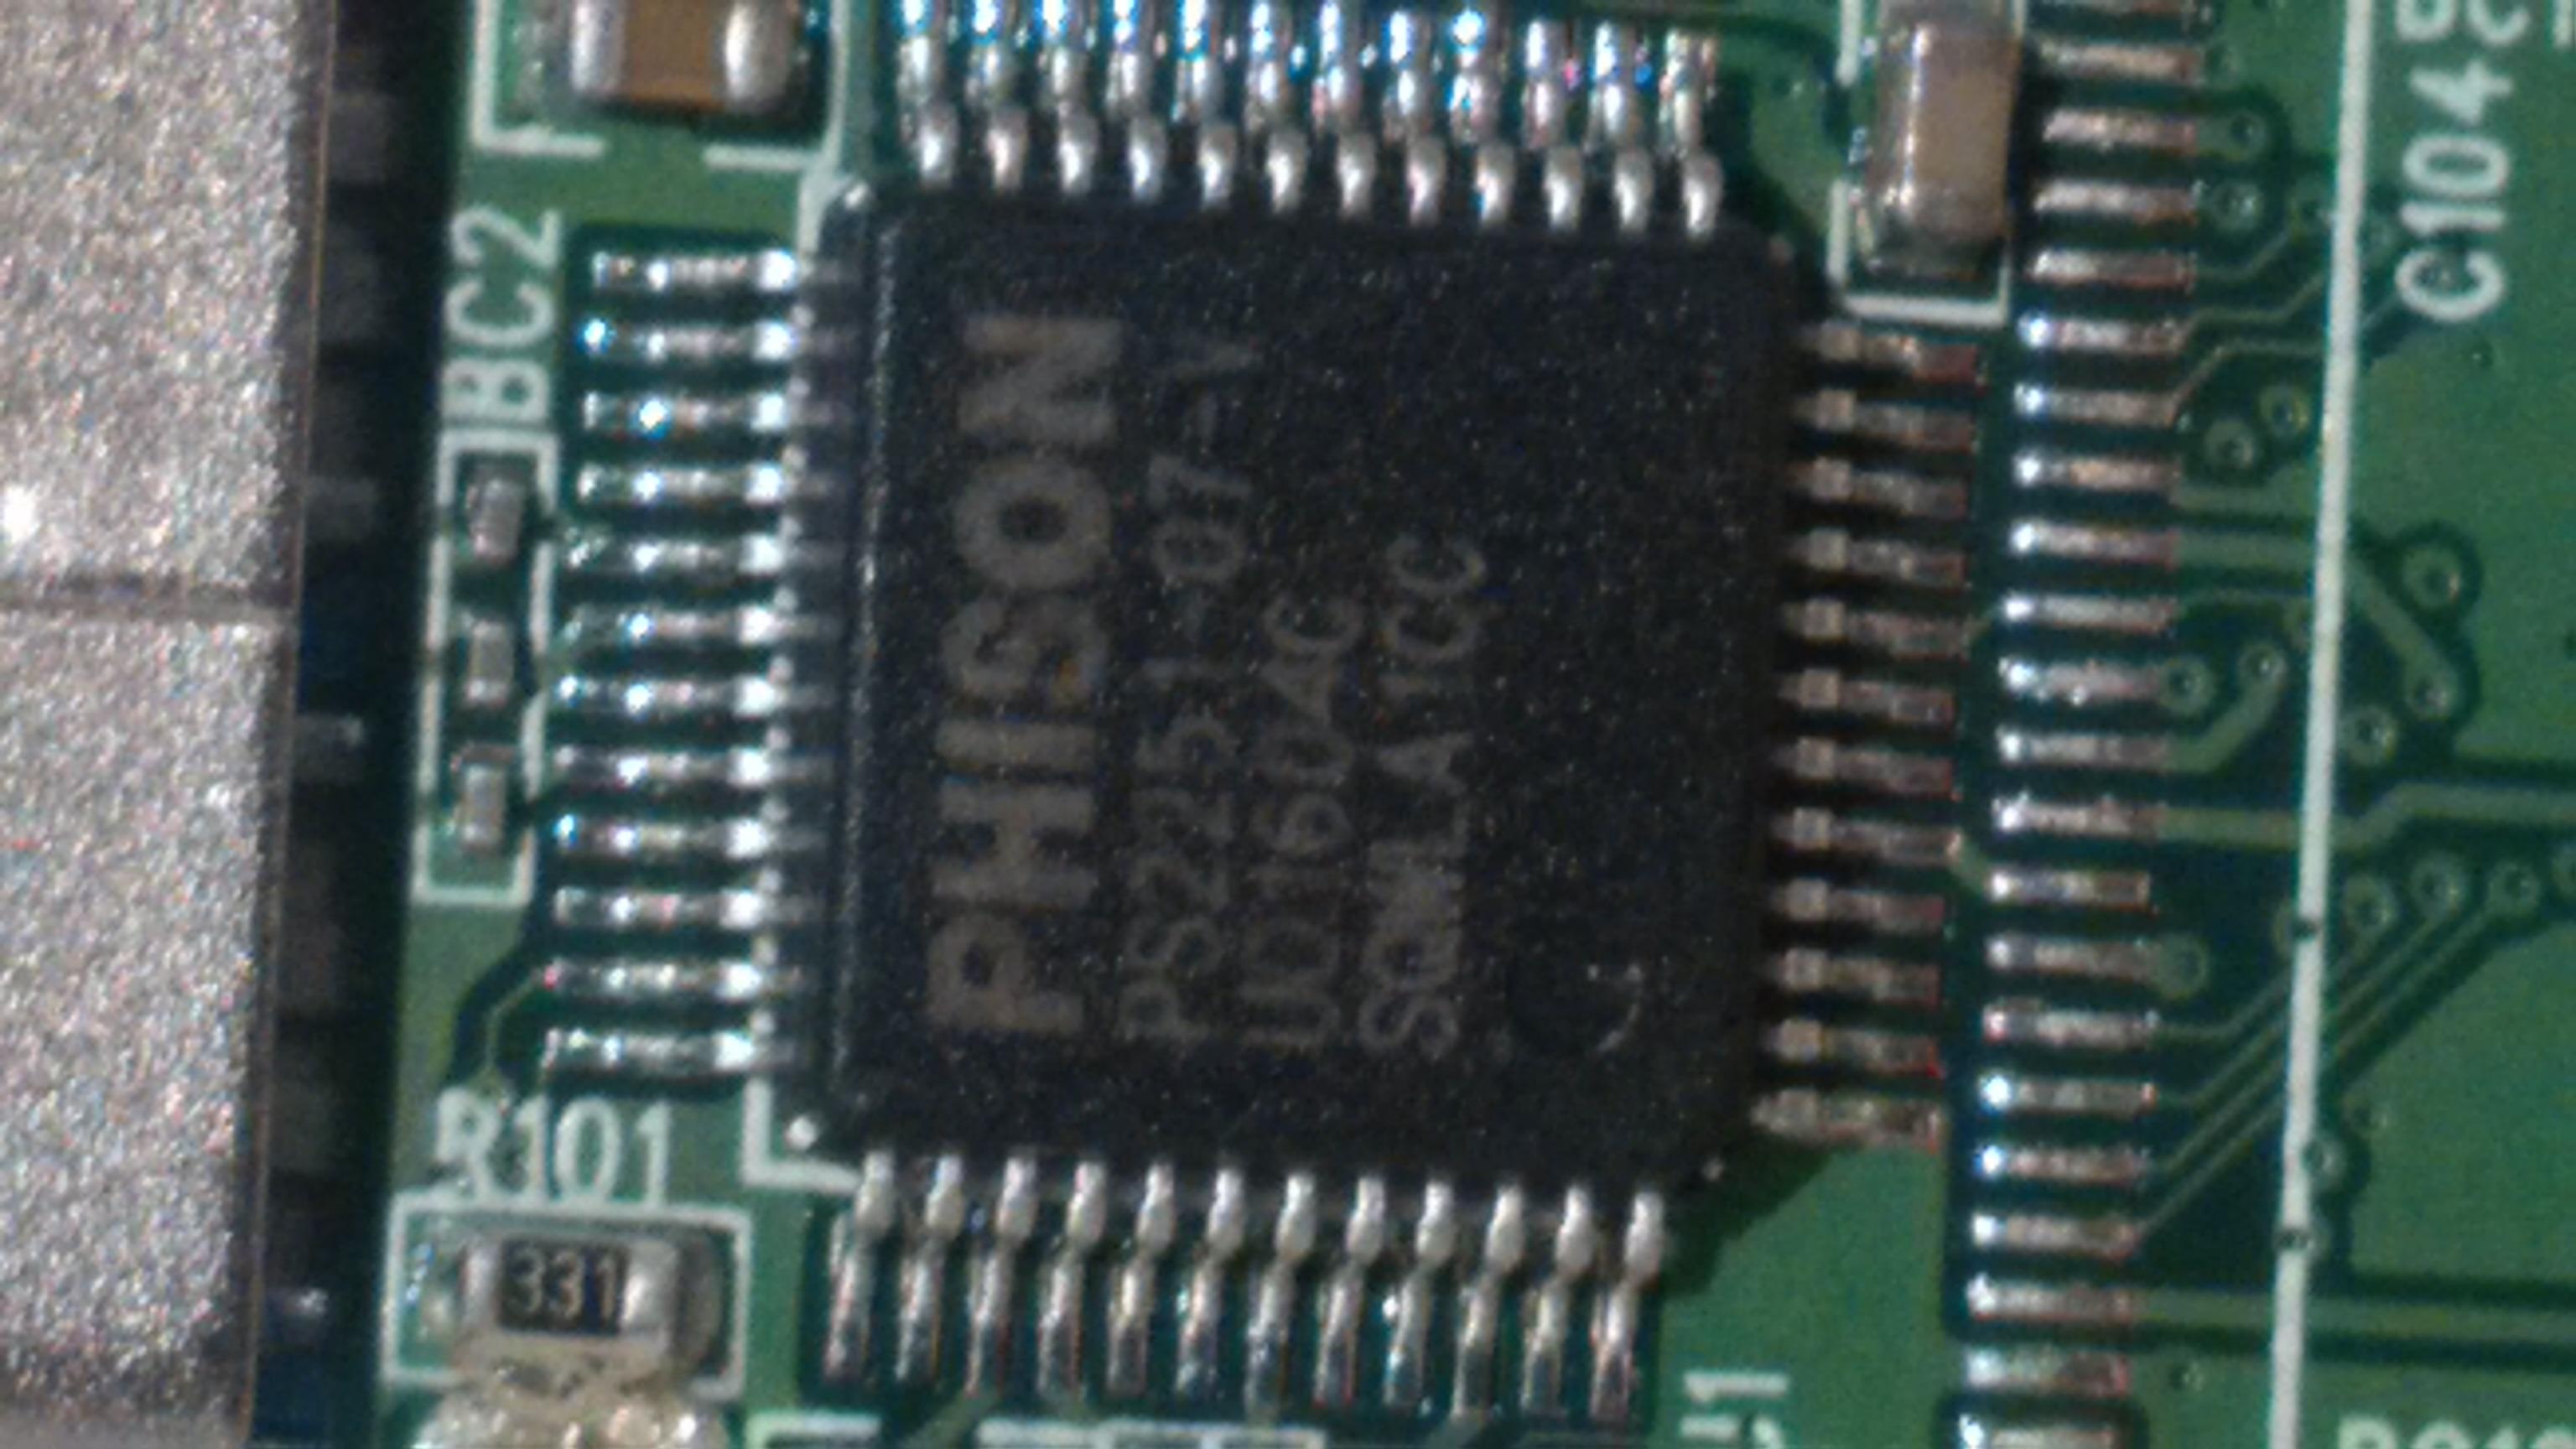 Clé UBS Dell - ChipSet PS2251-07